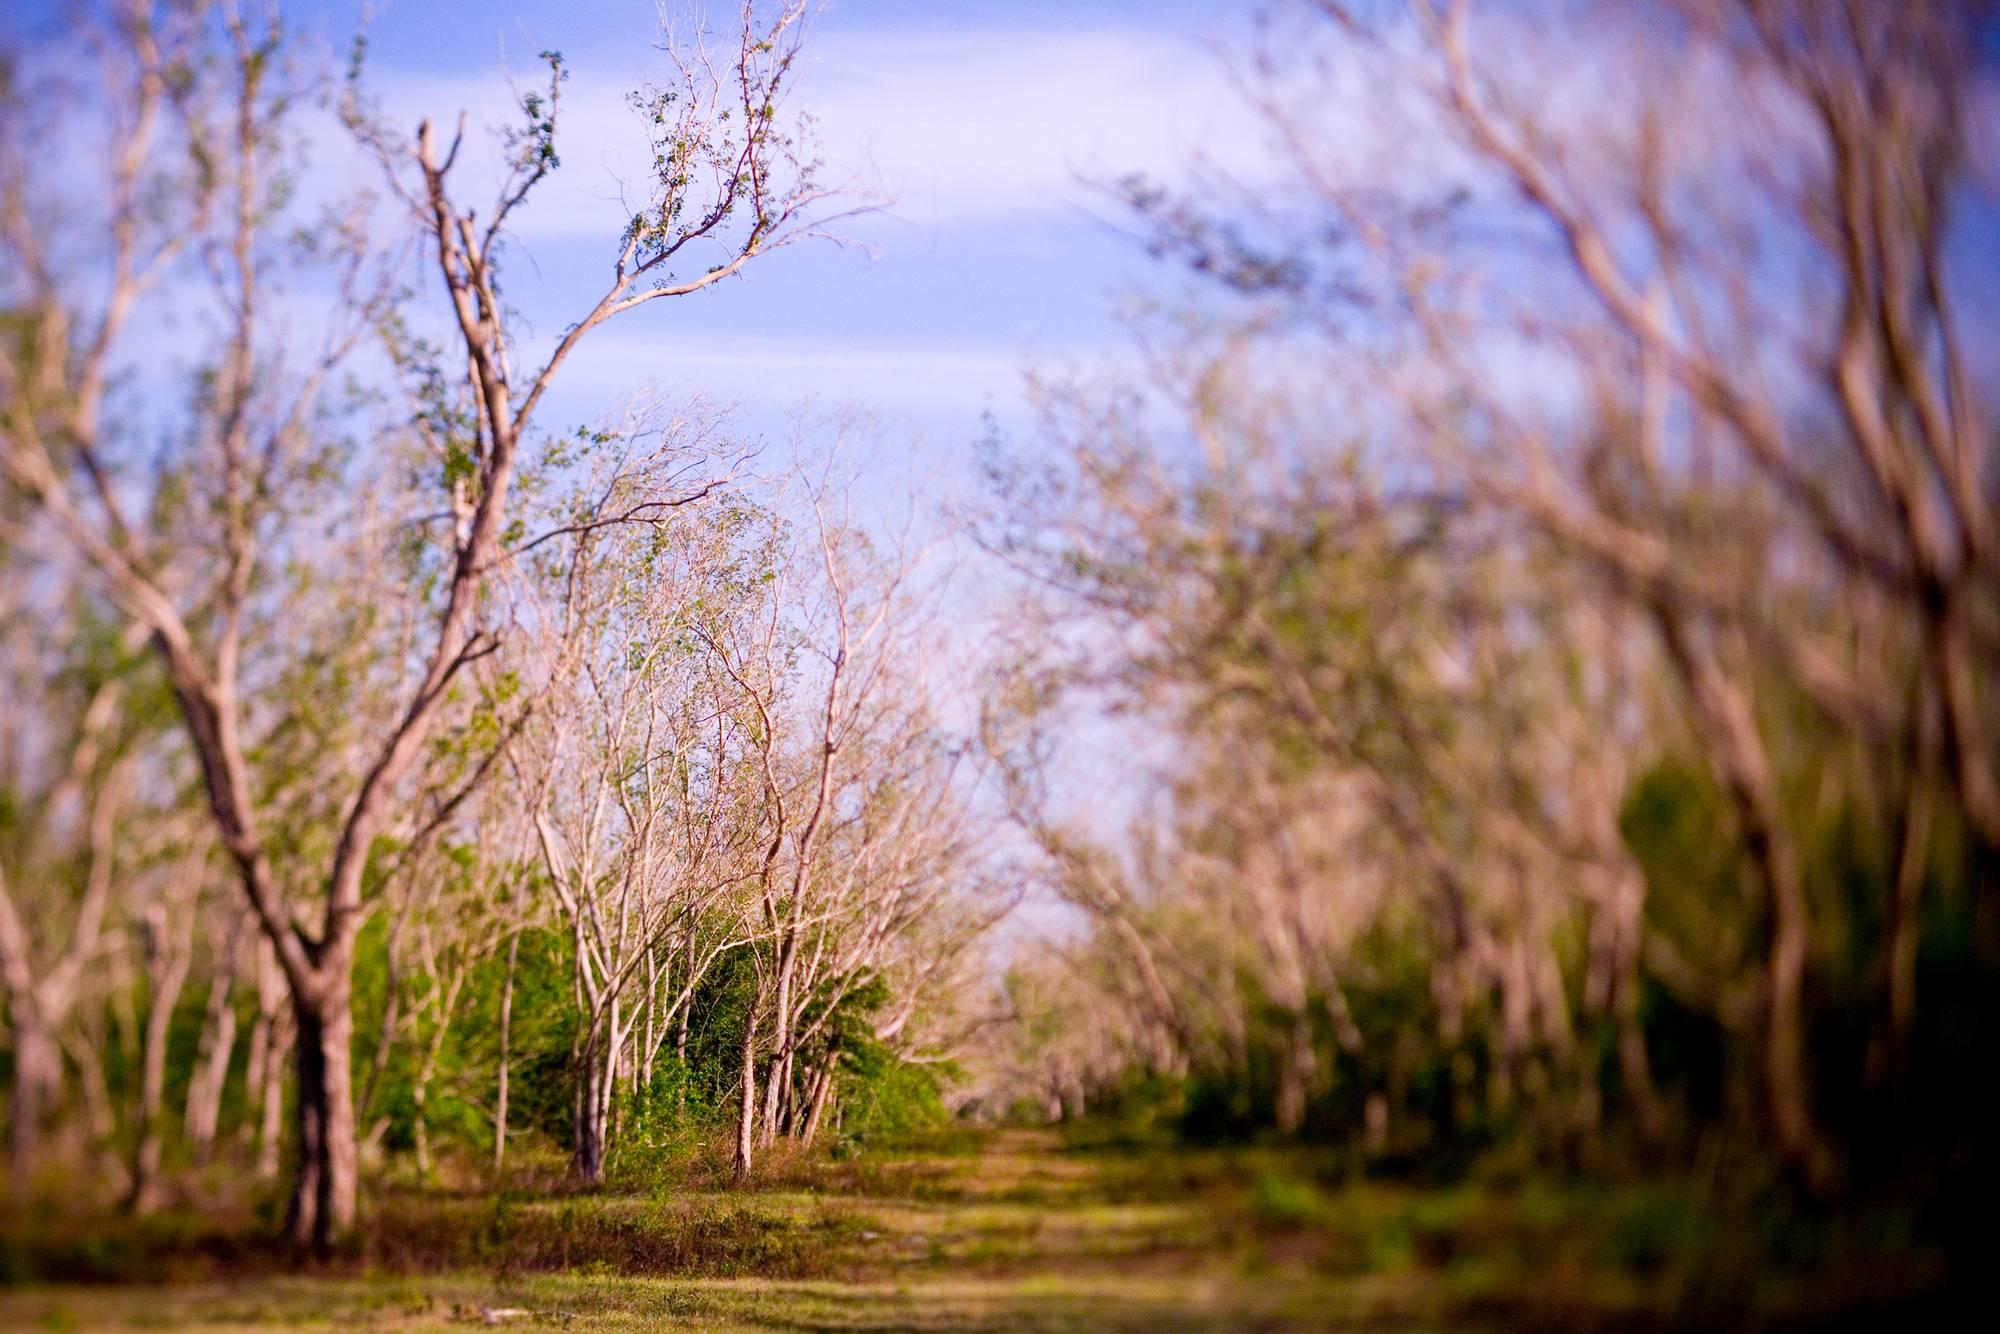 RiverTrees0003.jpg